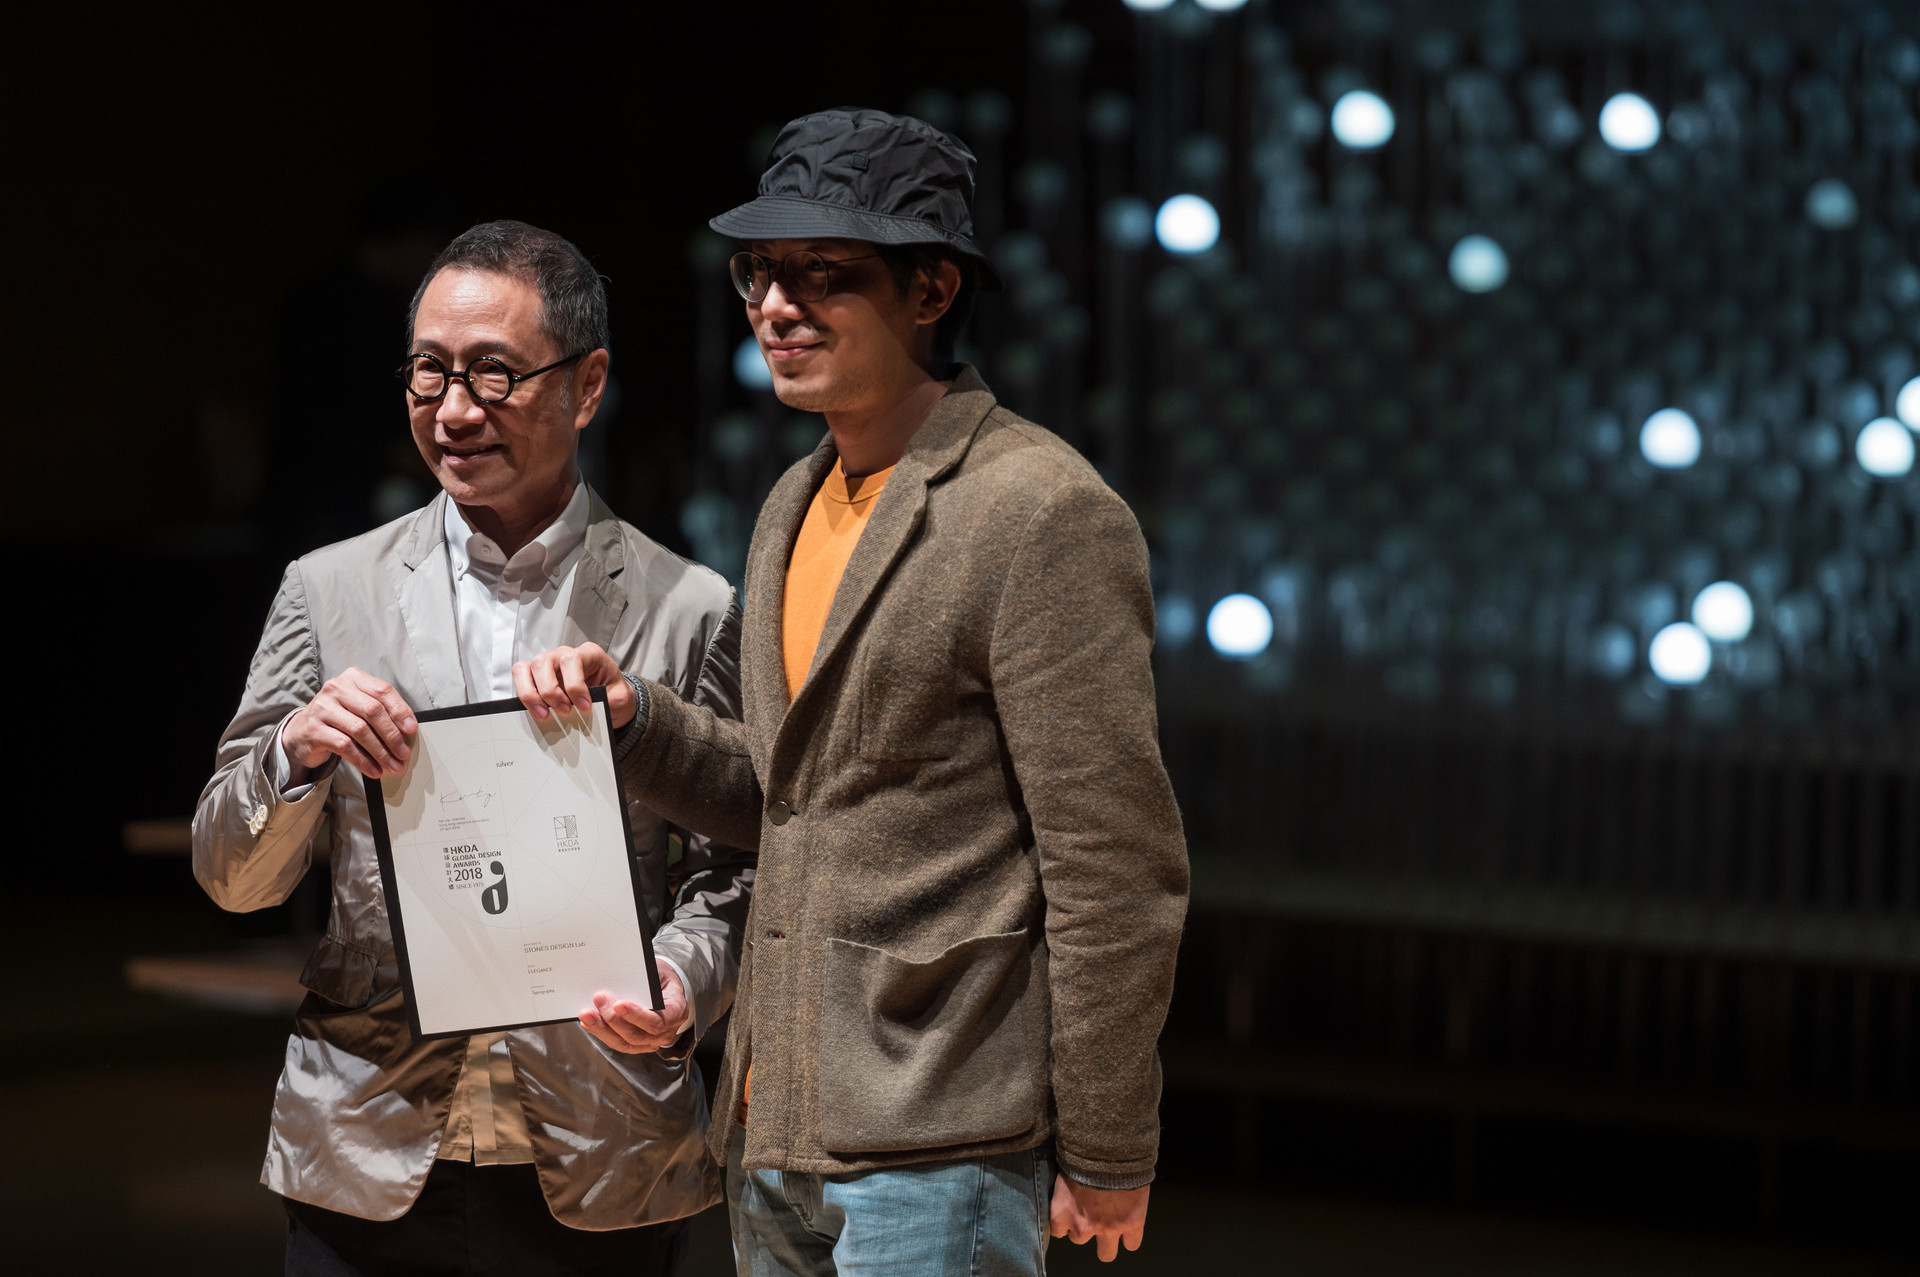 2 asian men with HKDA Global Design Awards certificate presented